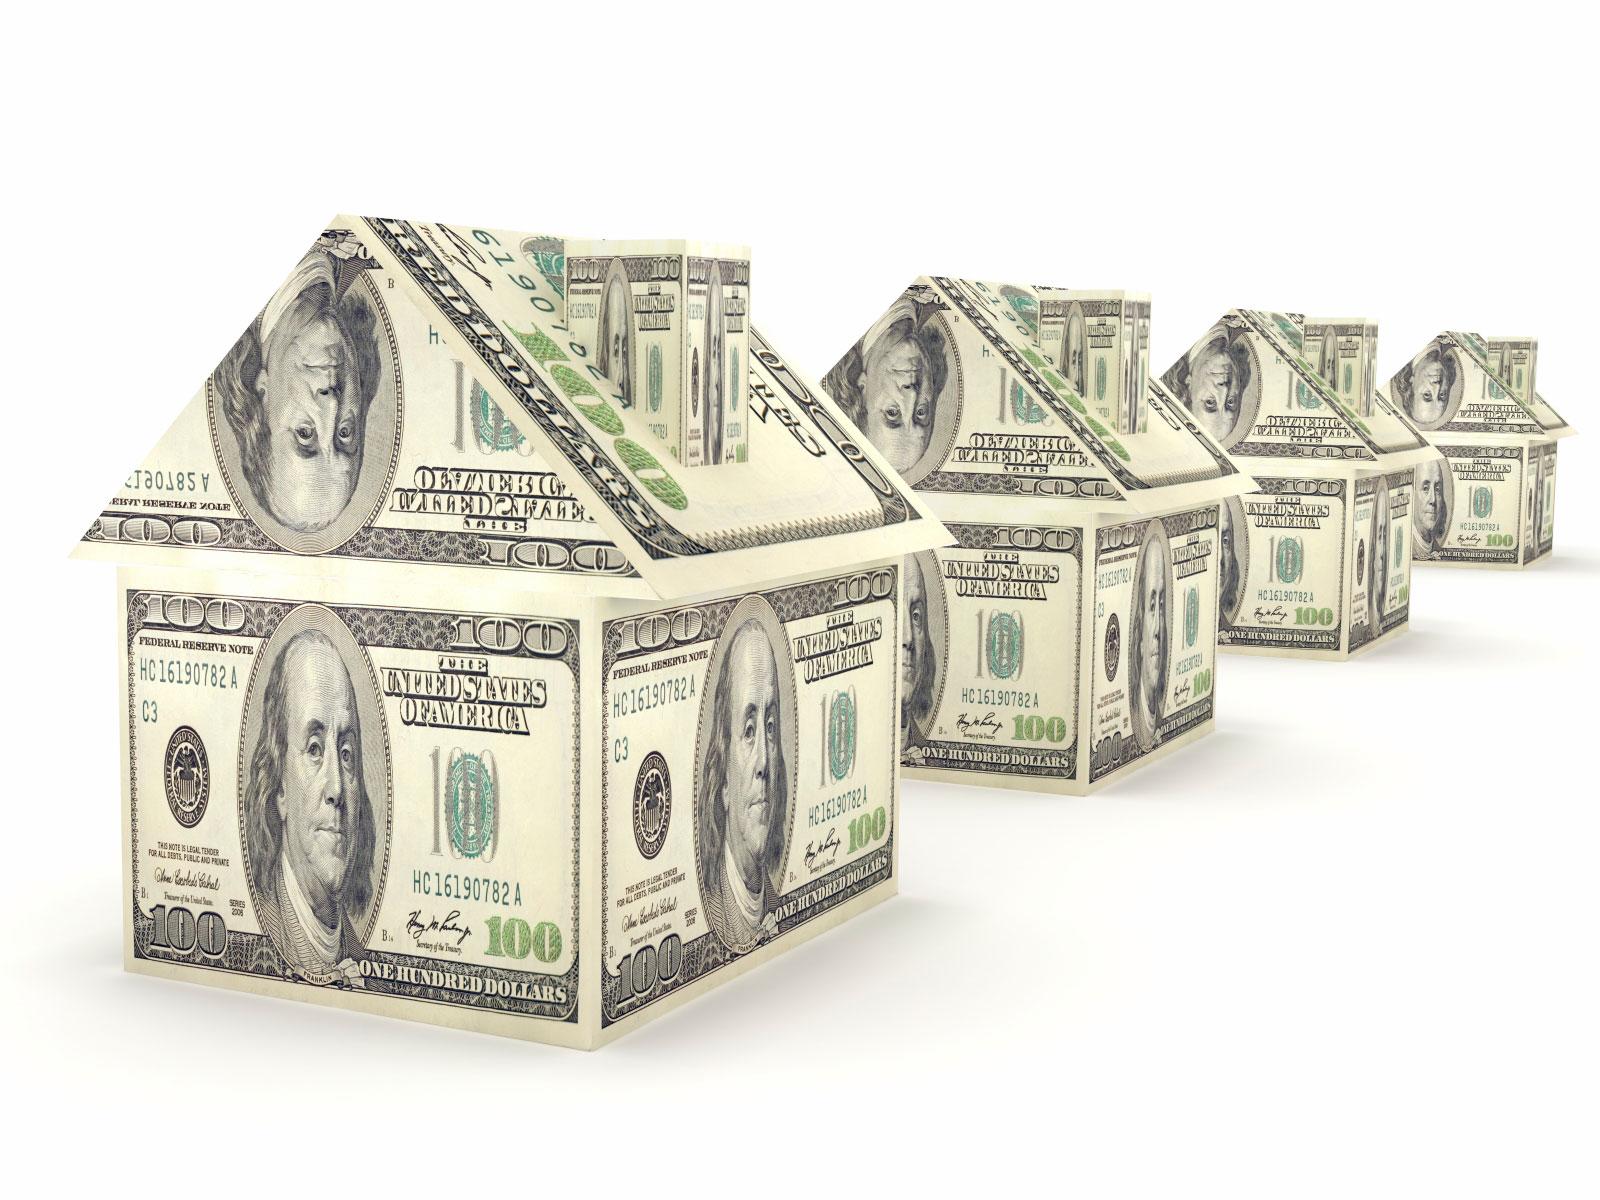 How to buy a home with Zero Down Payment in Arizona - Home Loan - Sun American Mortgage   Arizona, Utah, California